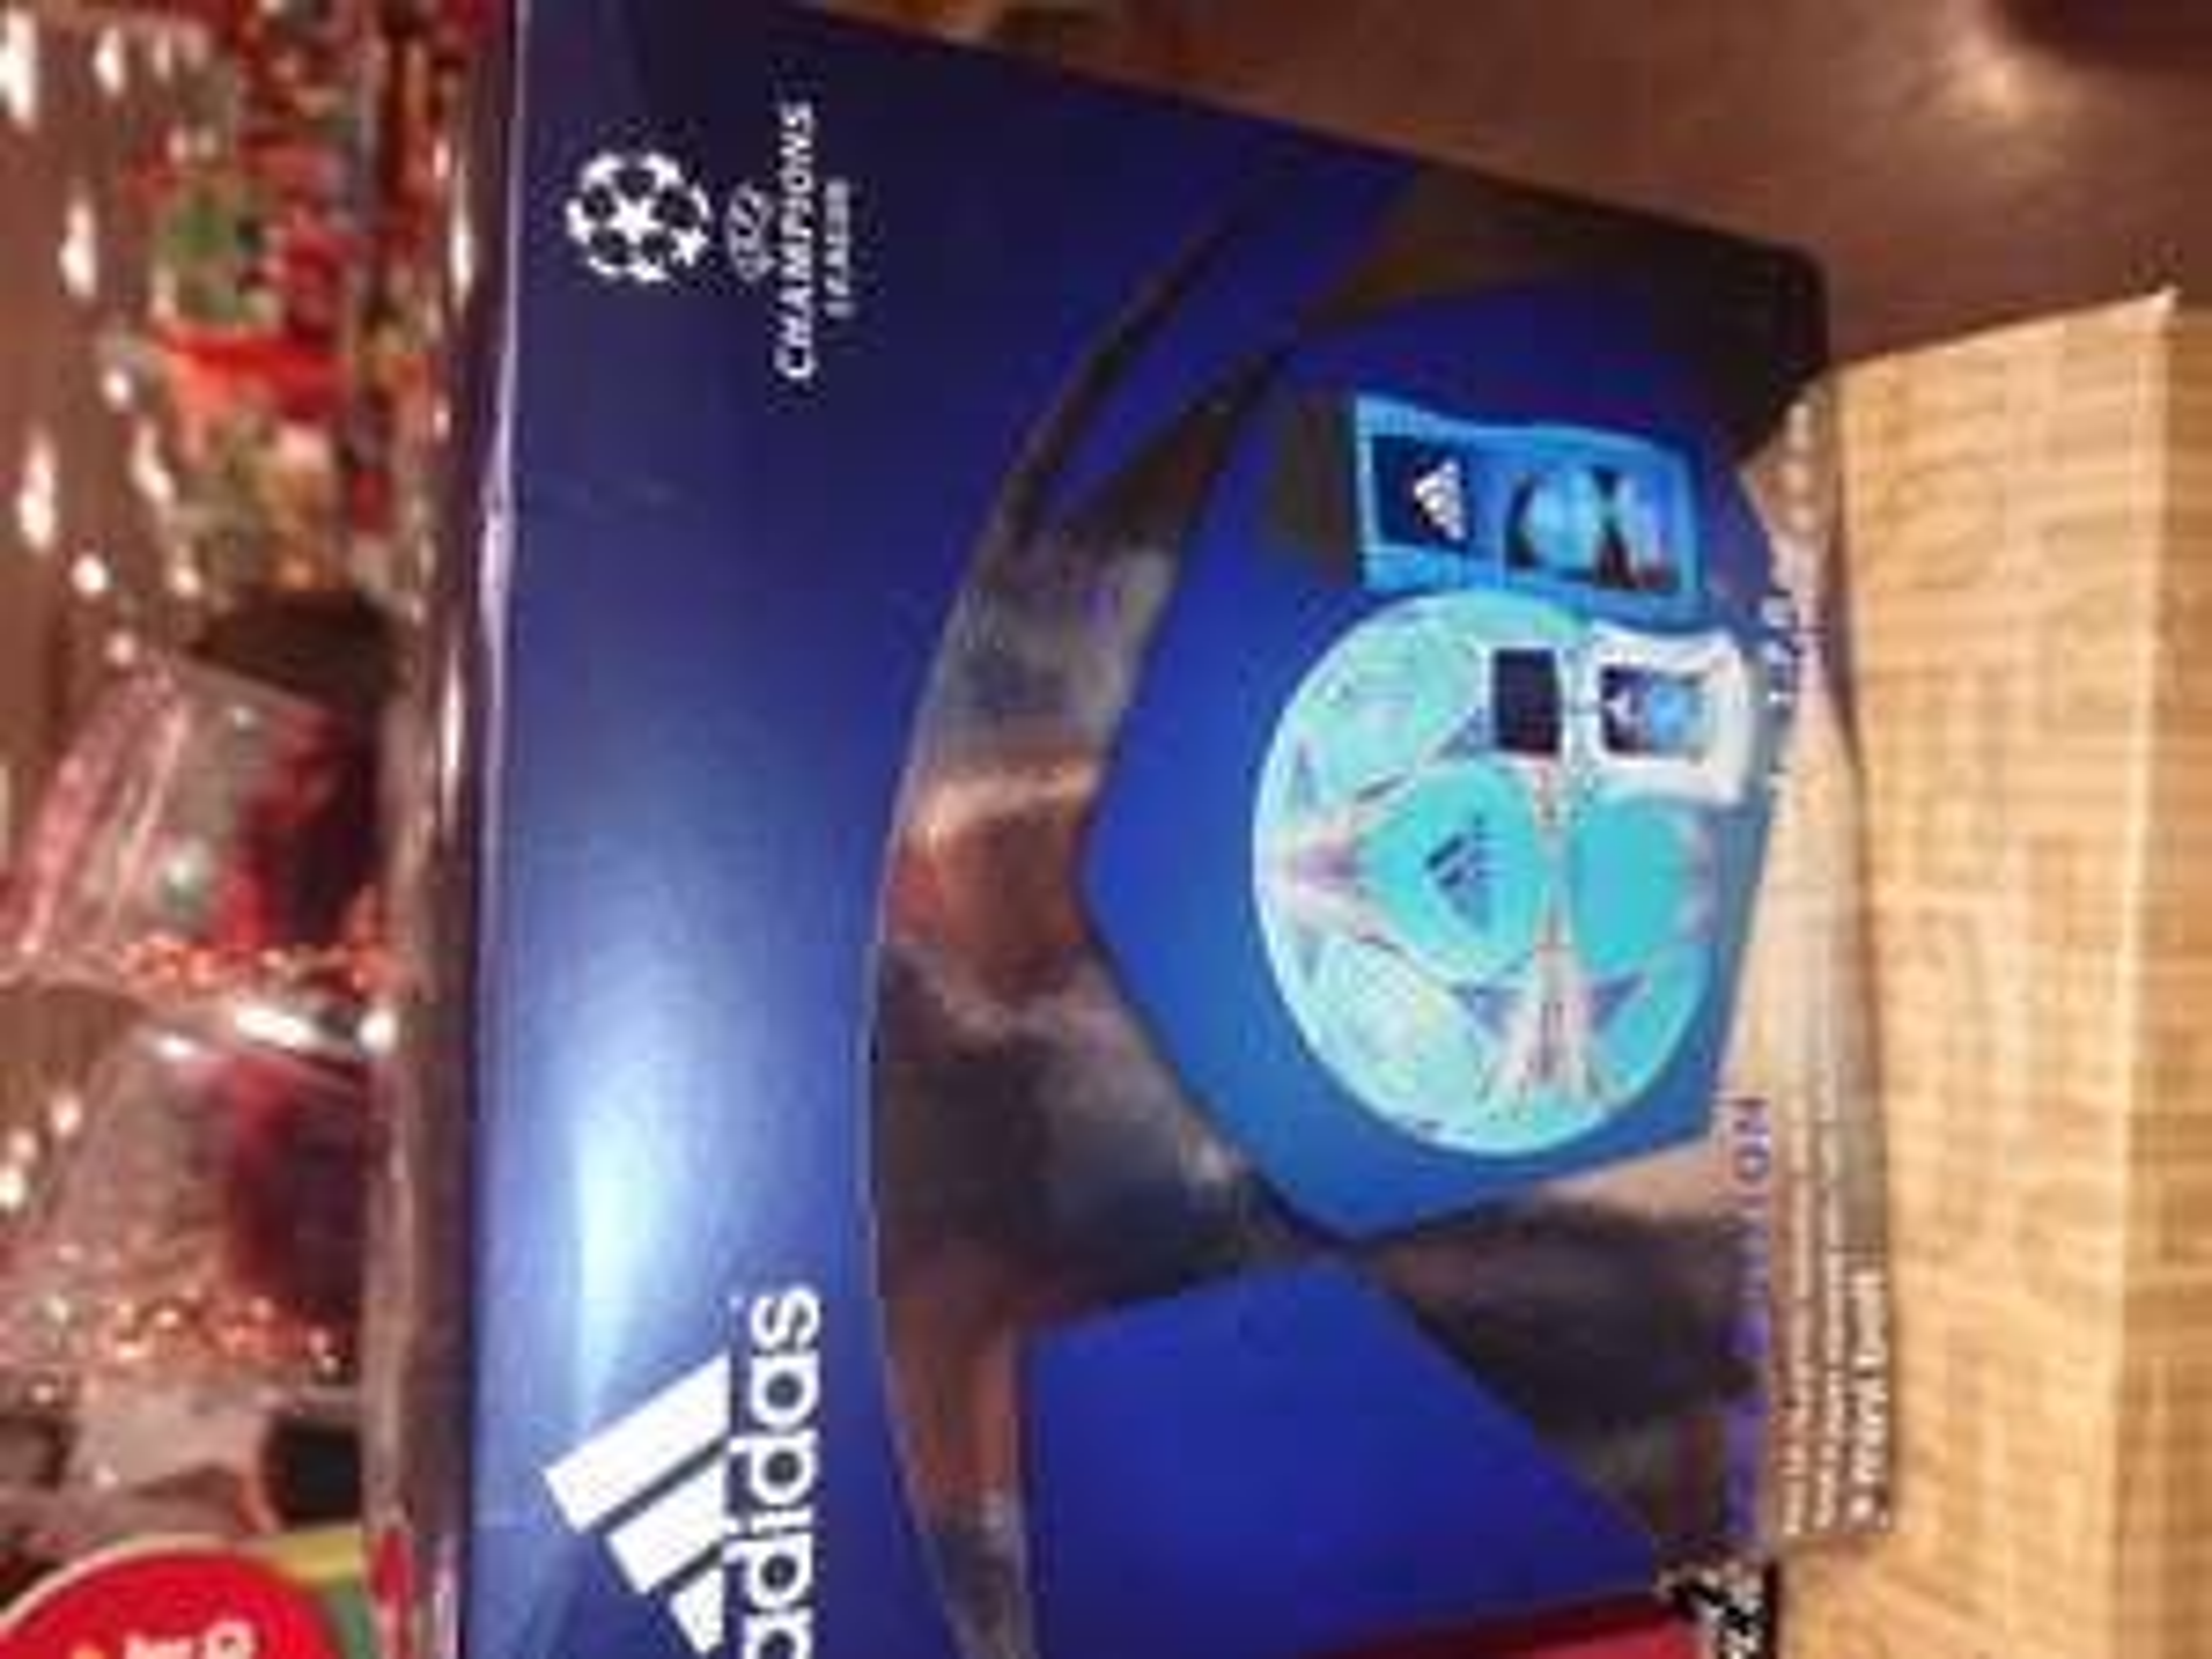 Addidas Star edition Champions League EDT 50 ml ,gel250 ml + mini ball £ 9.99 TKMAXX